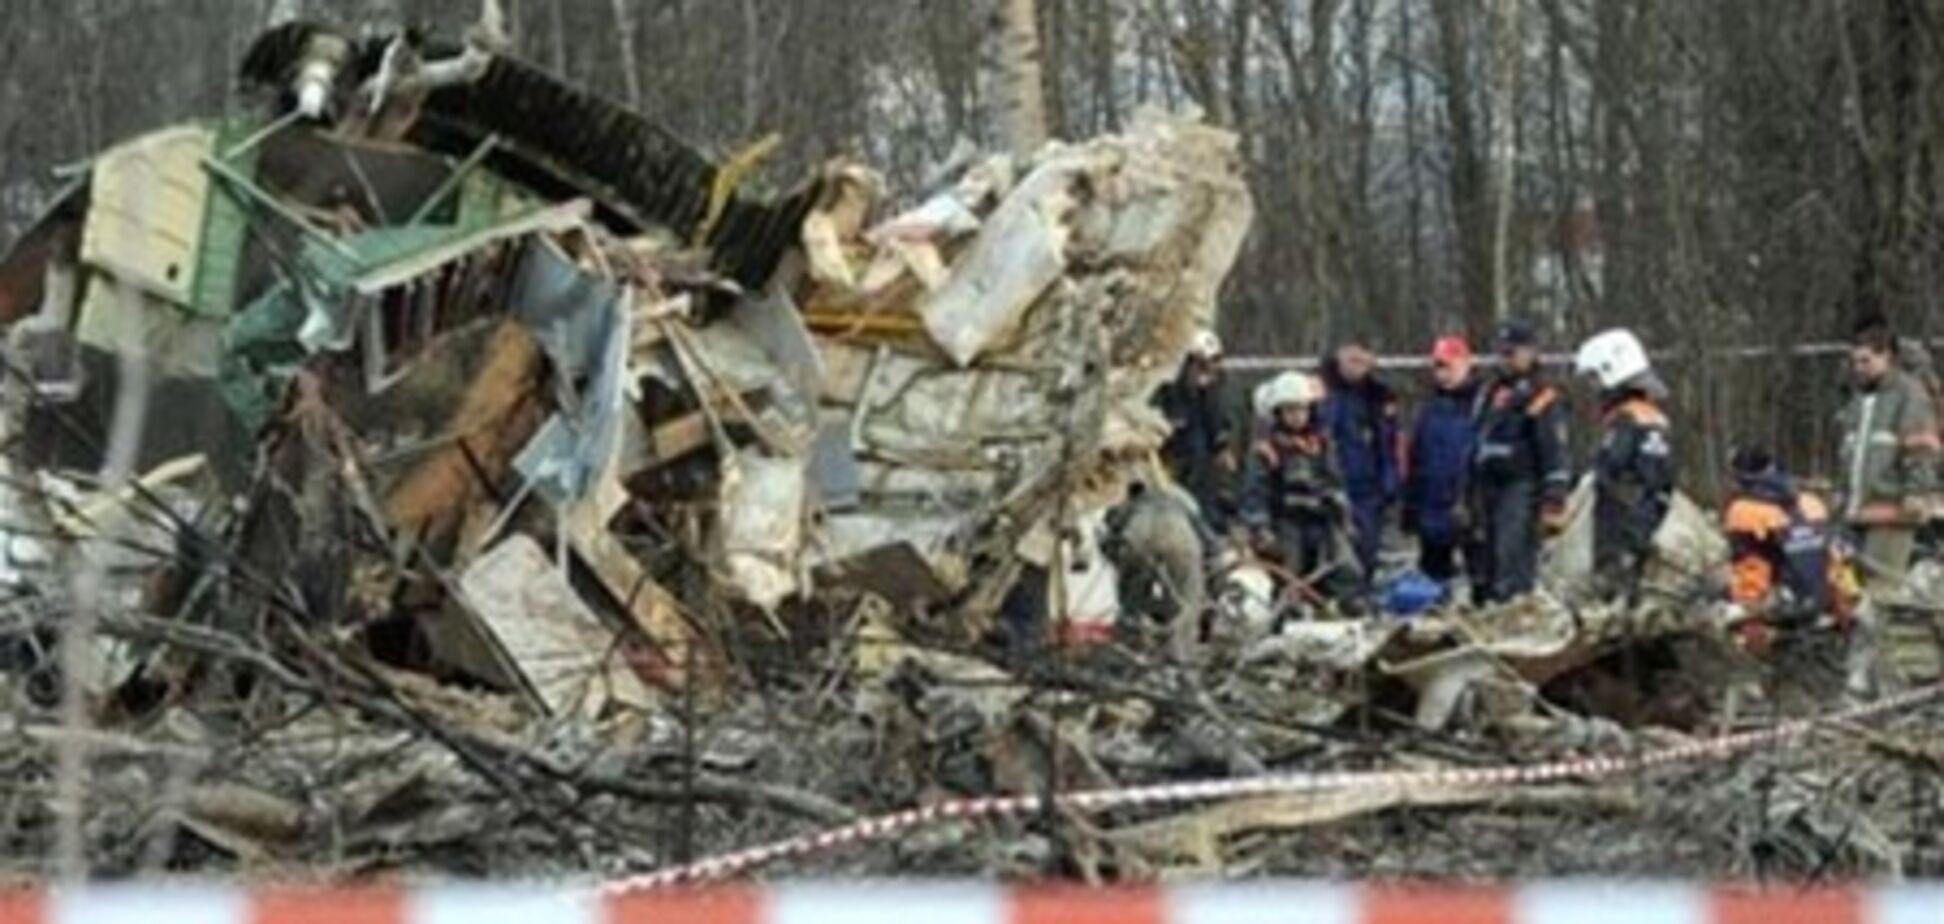 Доклад Польши: диспетчер давал неправильные команды экипажу Ту-154